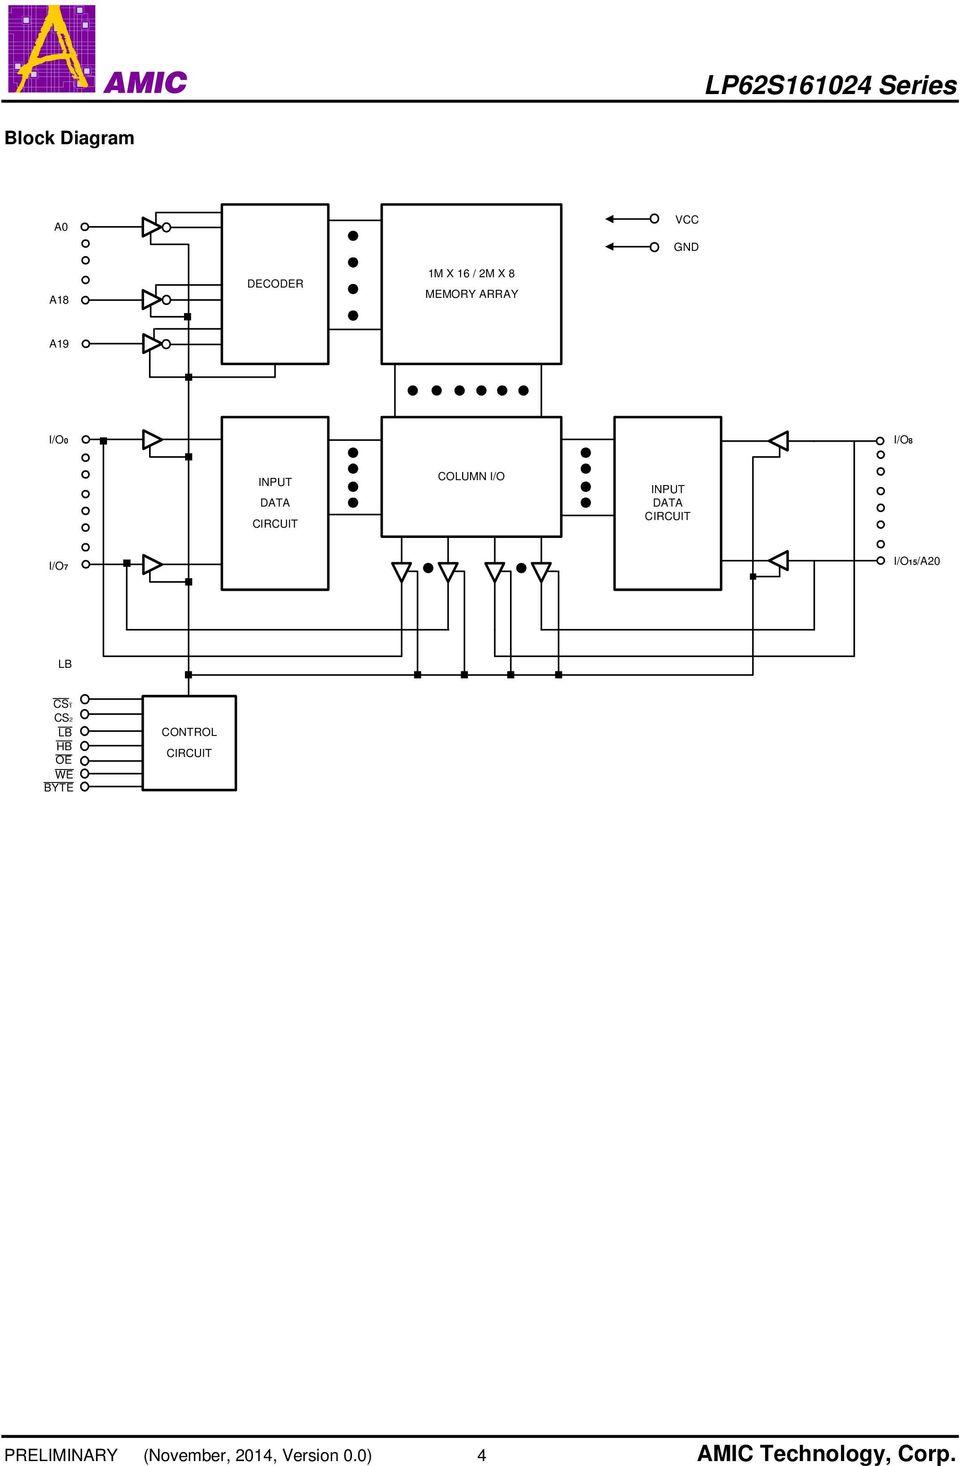 hight resolution of circuit i o7 i o15 a20 lb cs1 cs2 lb hb oe we